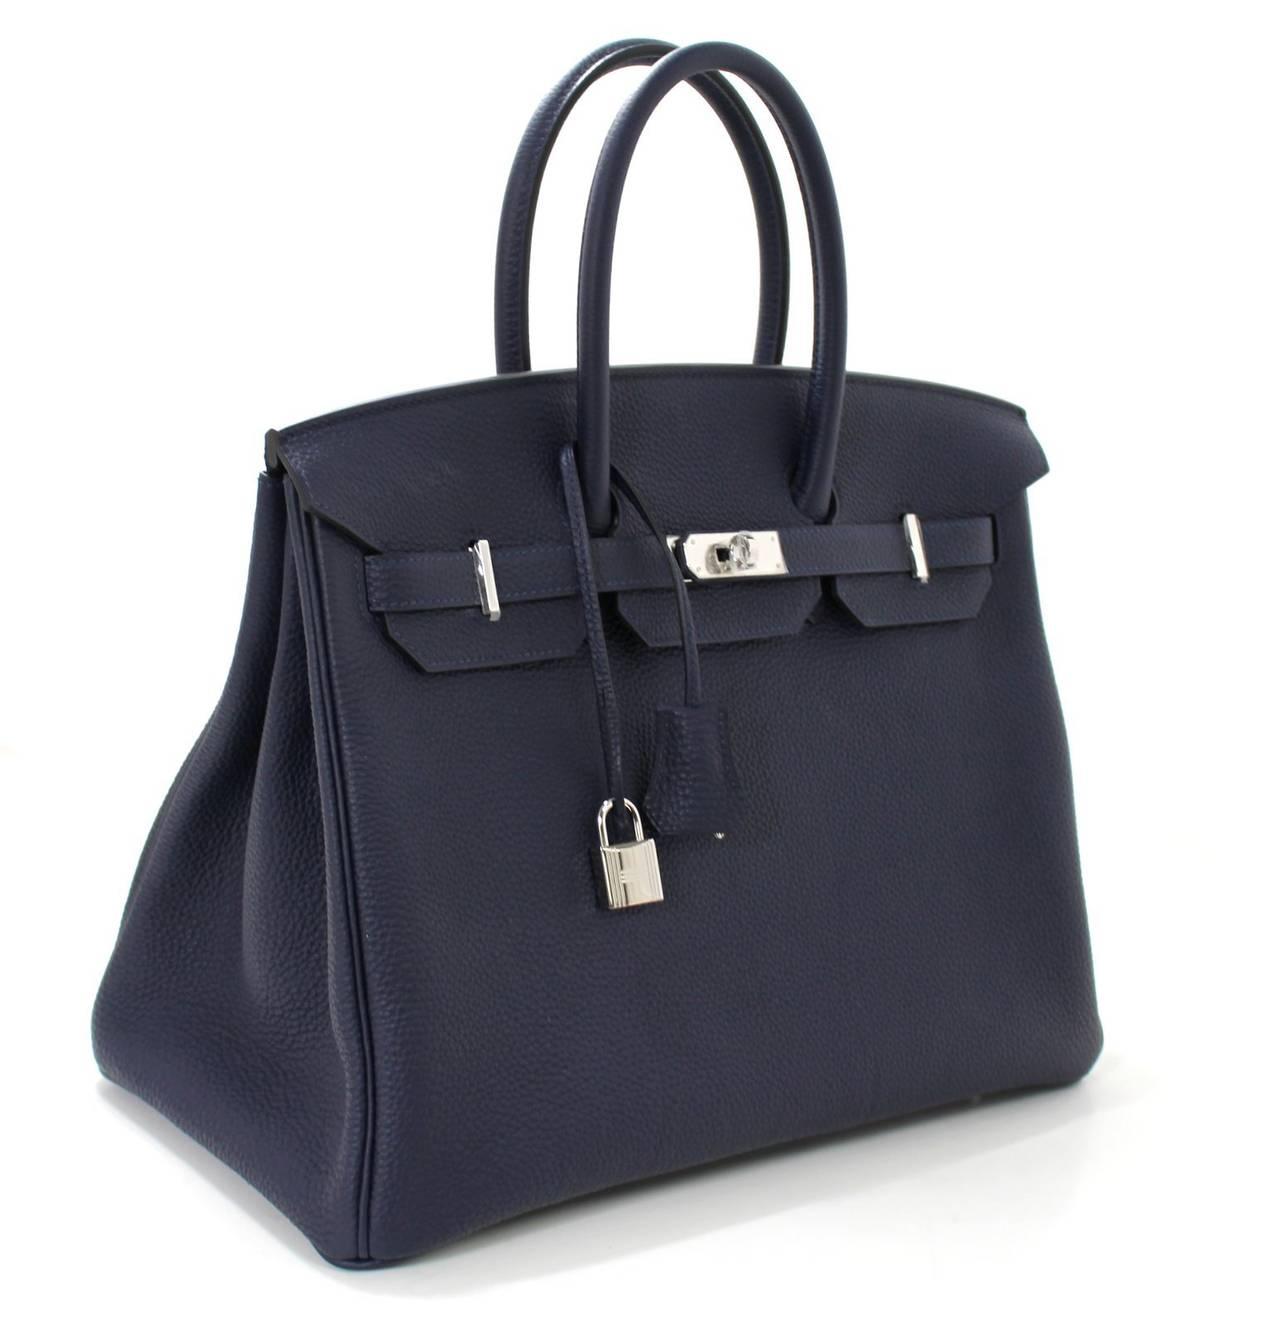 Hermes 35 cm Navy Blue Nuit Togo Leather Birkin with Palladium 3